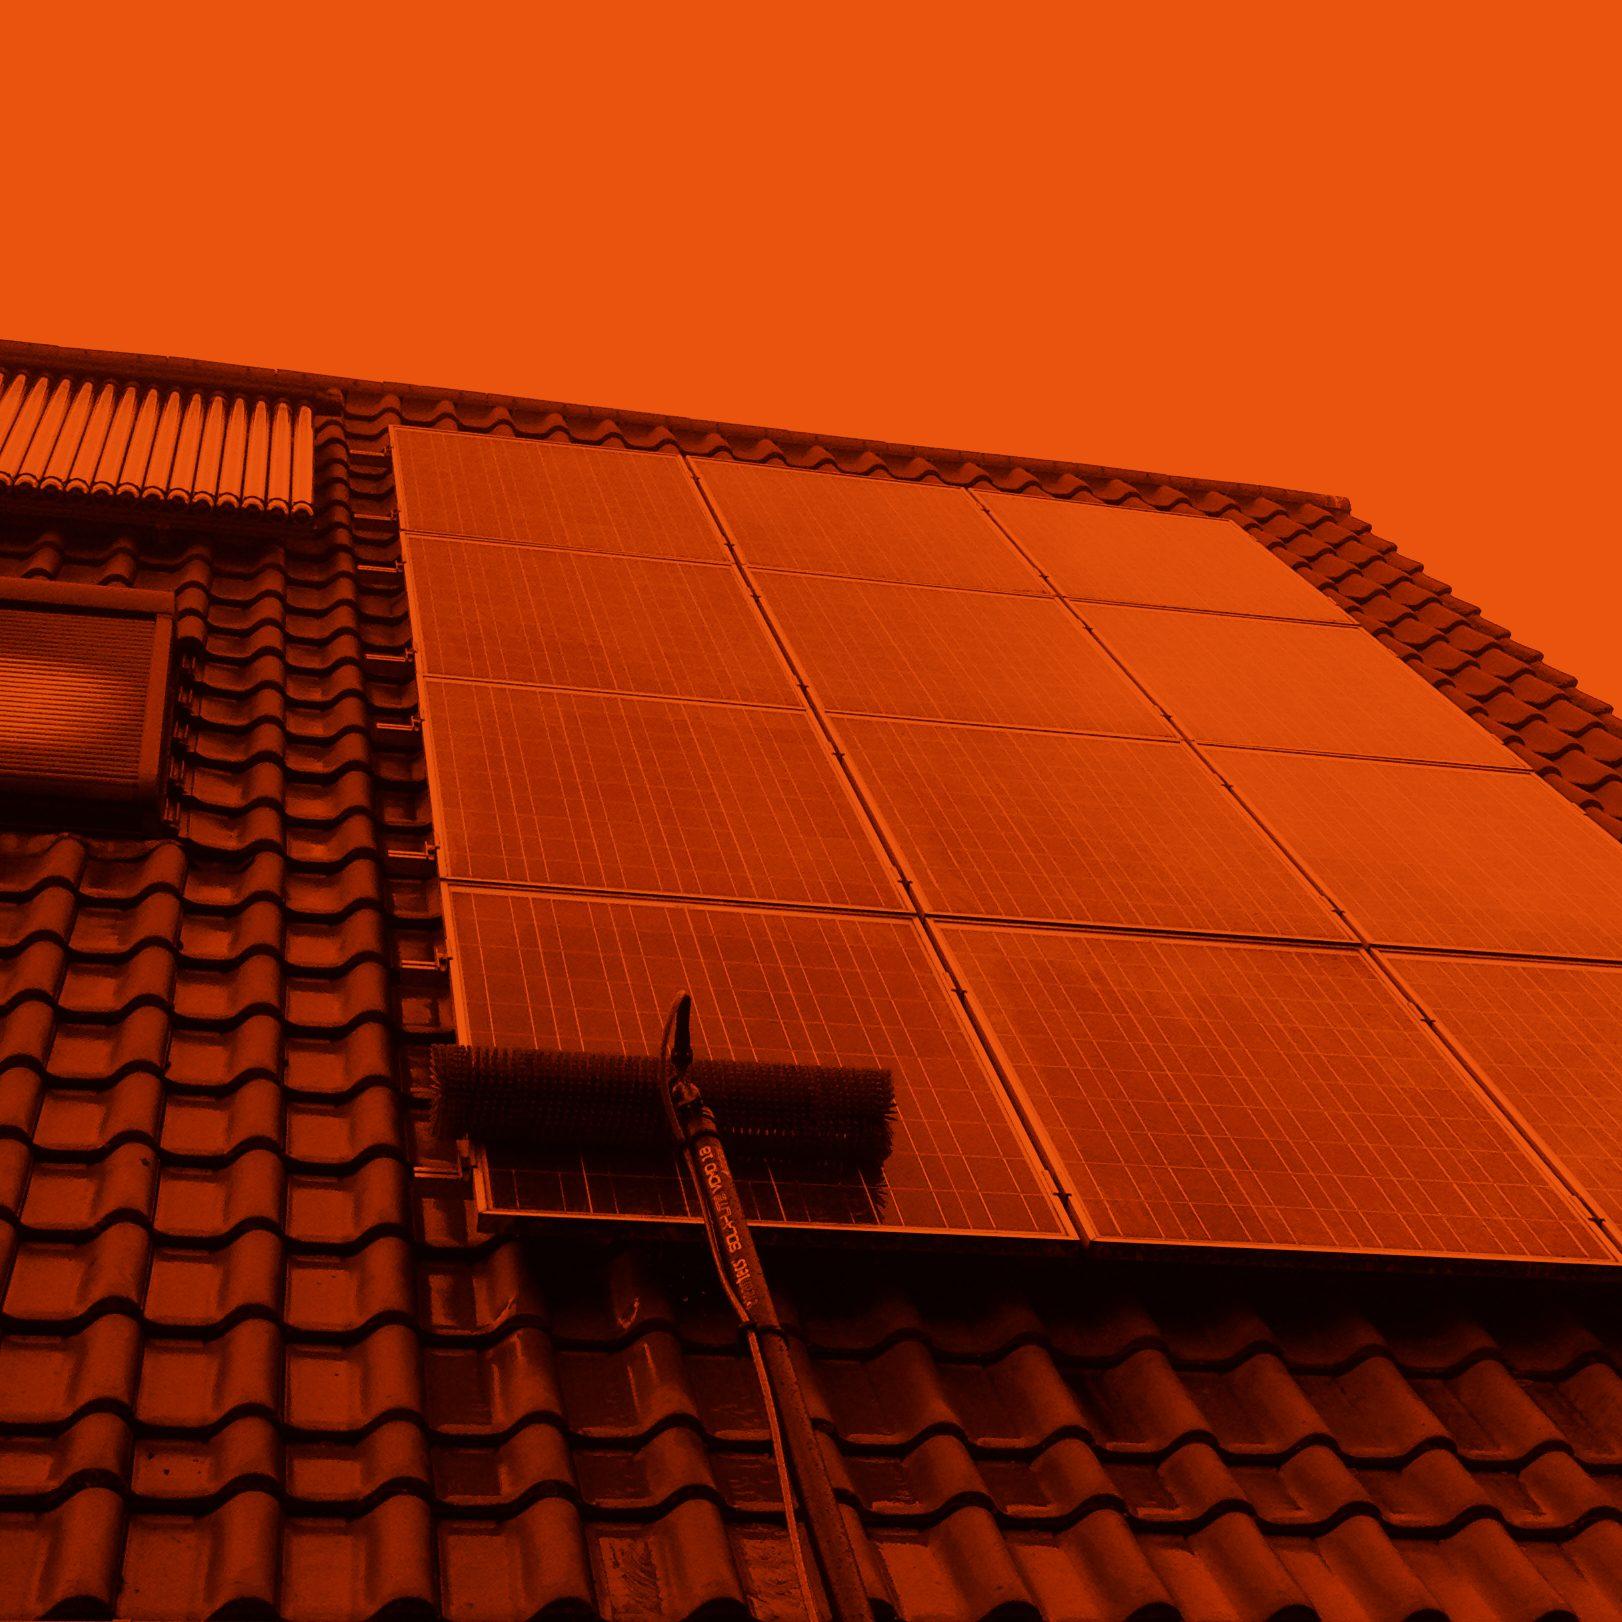 ineko_leistungen_solarenreinigung